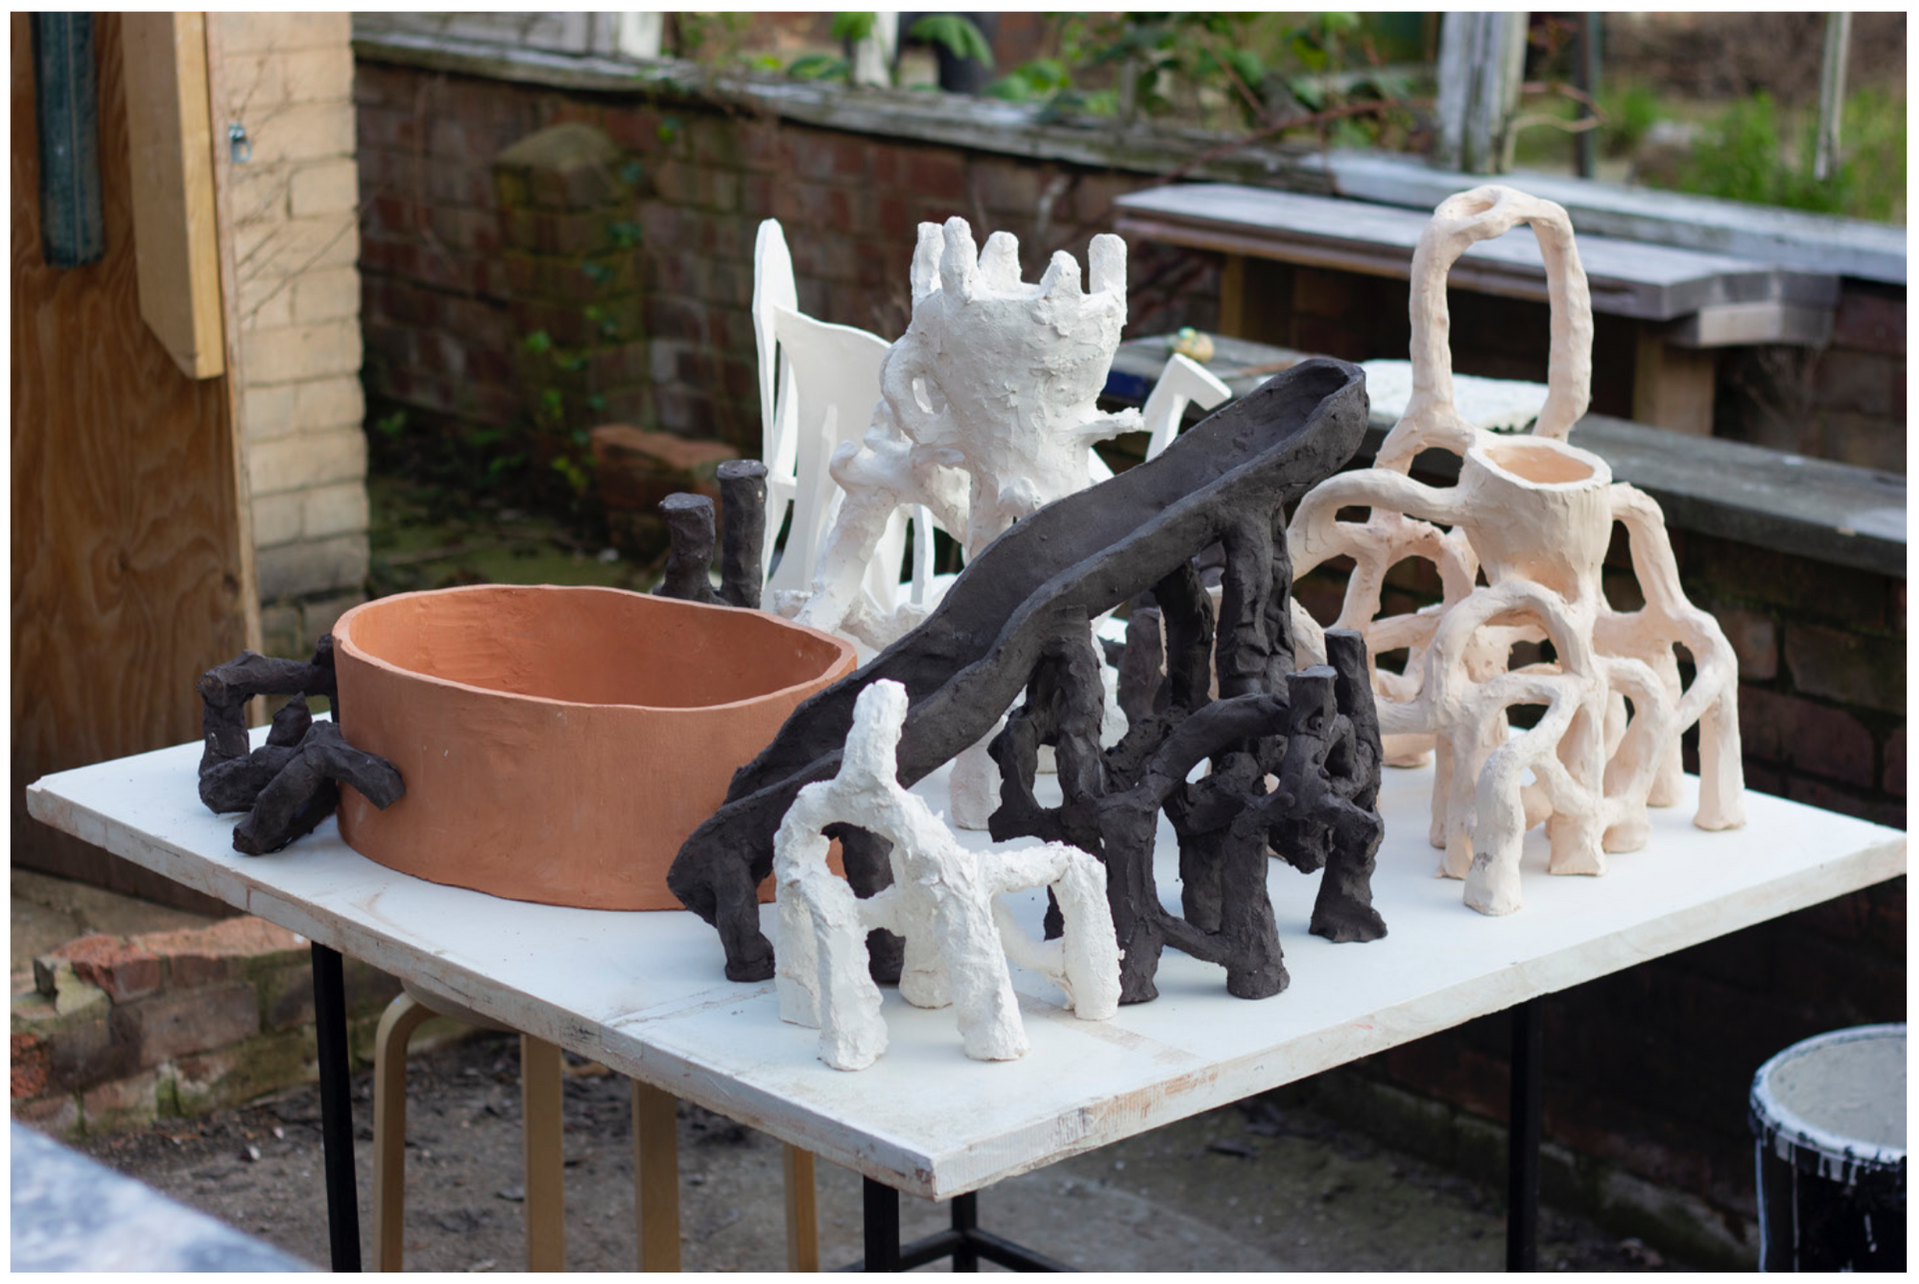 Mulch, 2019. Mixed ceramics